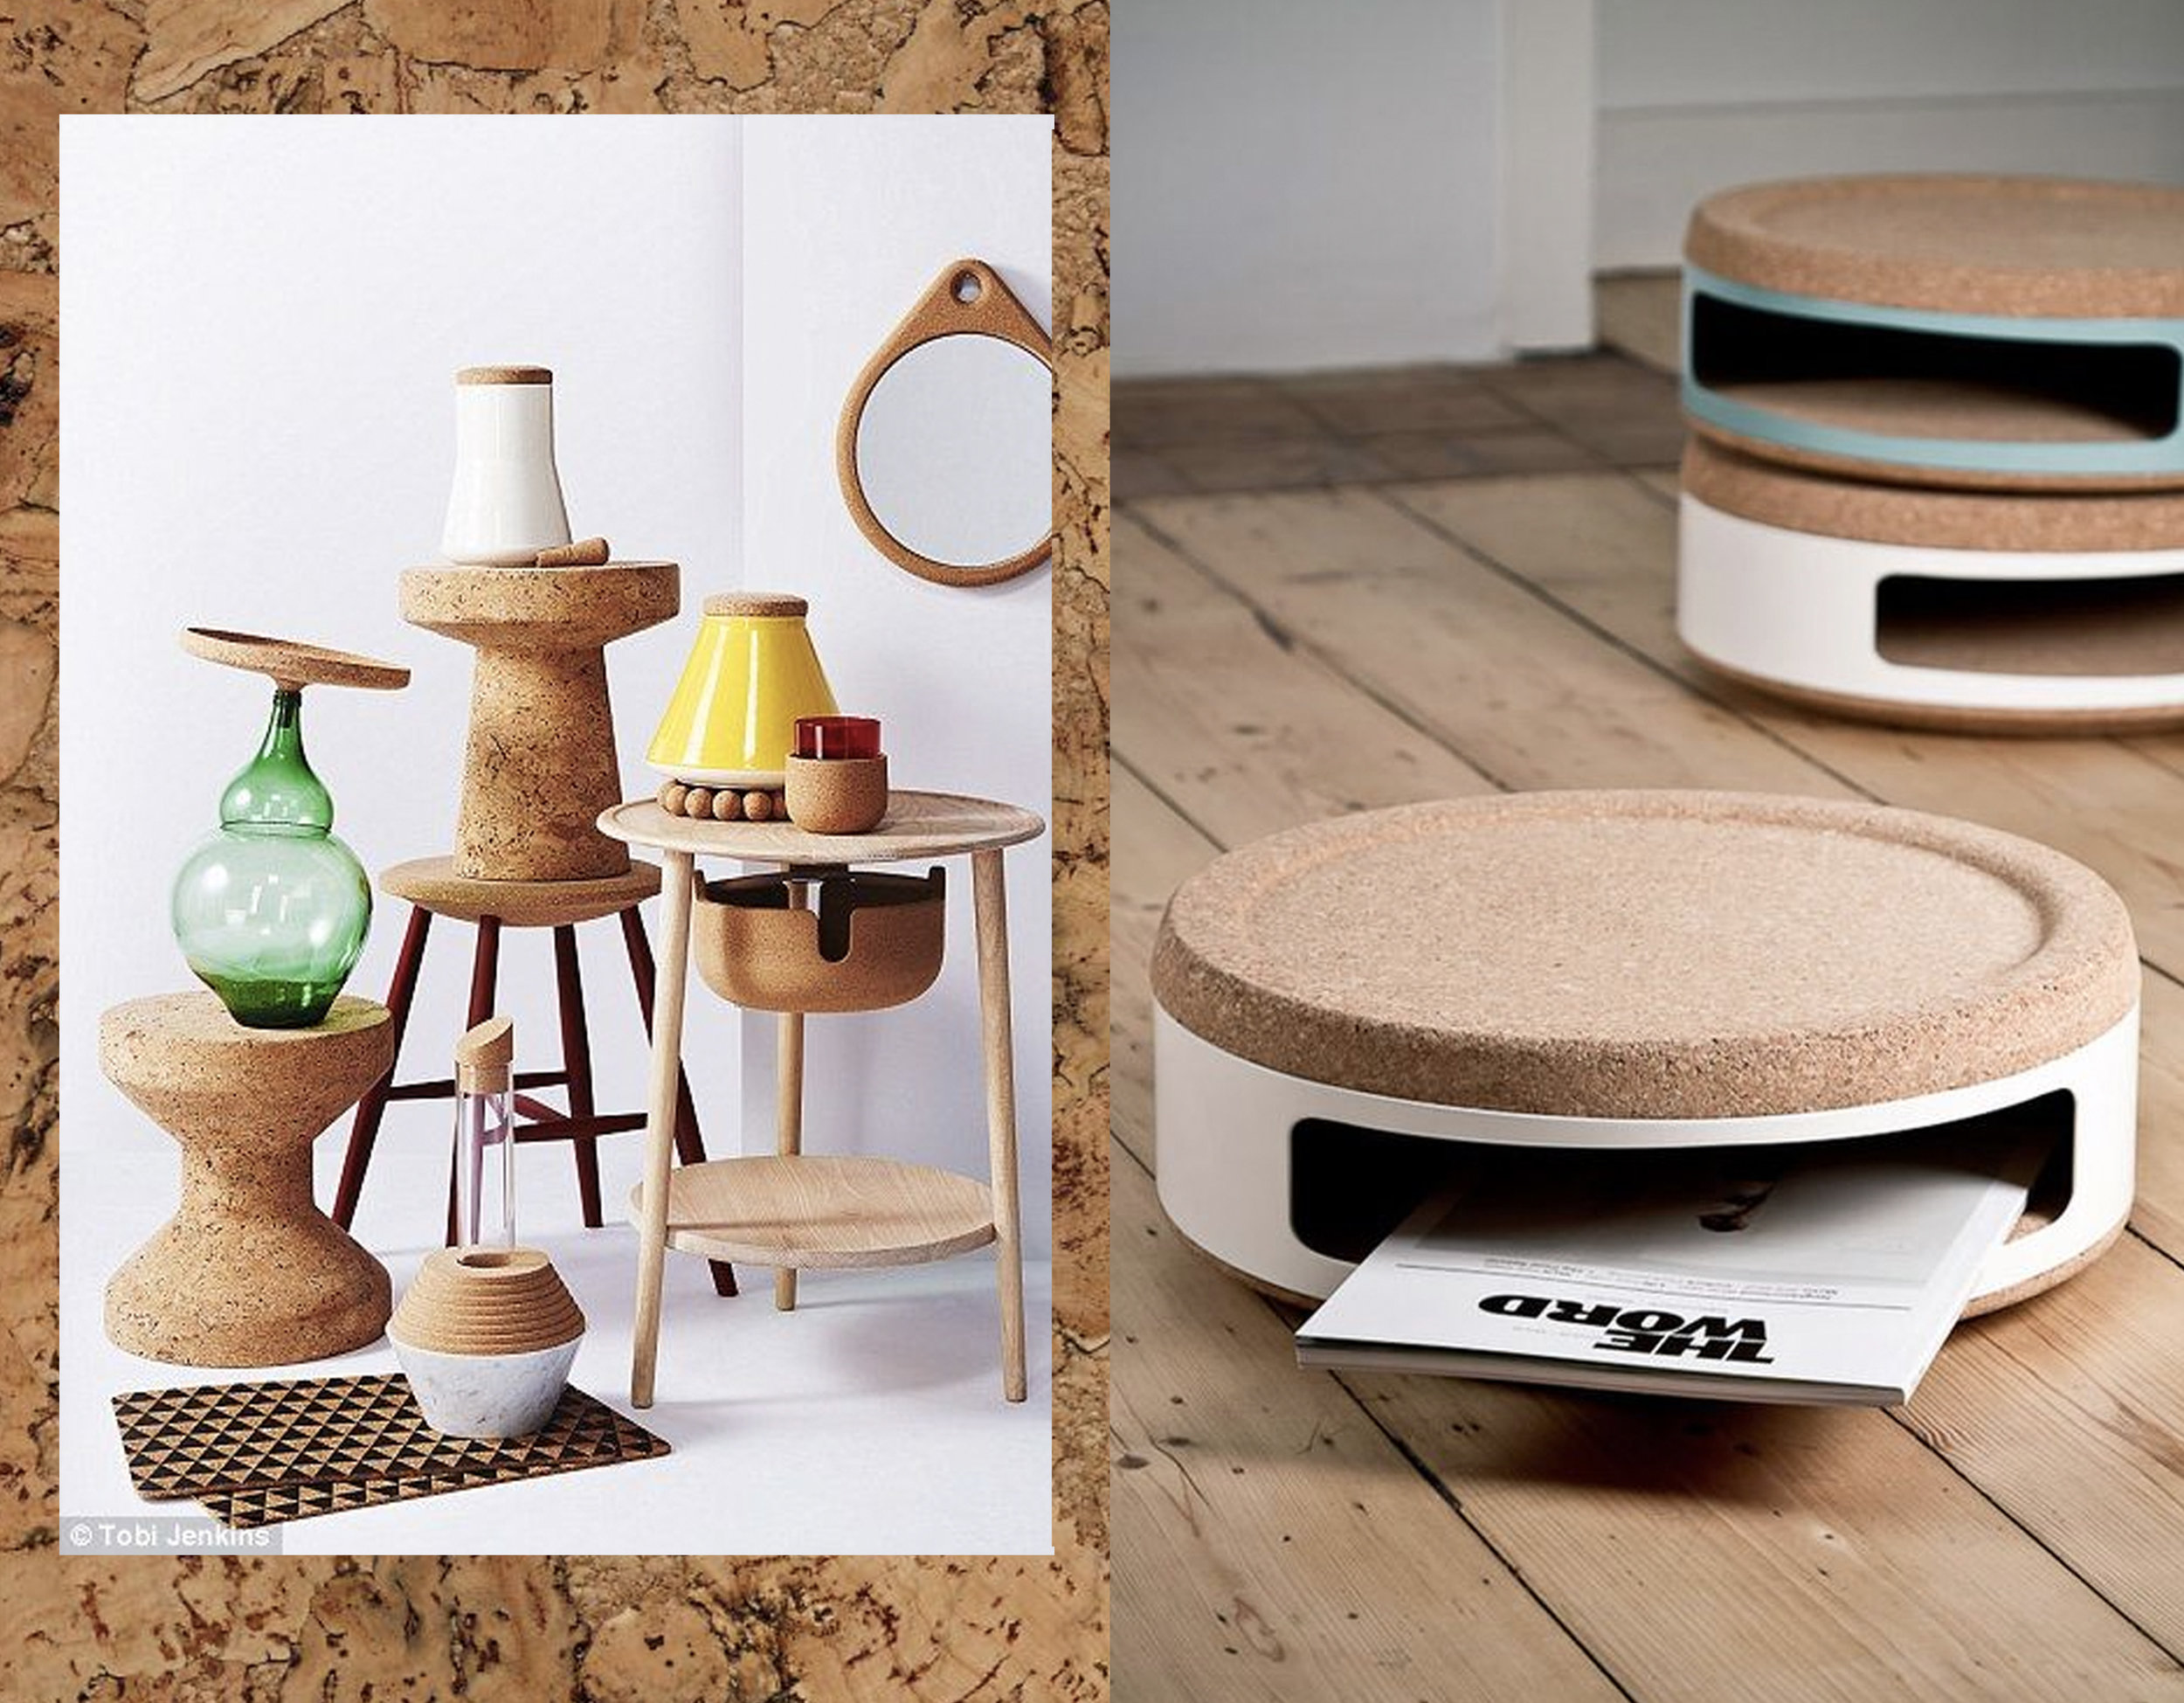 cork tile  Cork Store  - cork stools via  Daily Mail  - Kork Project  Studio Twodesigners